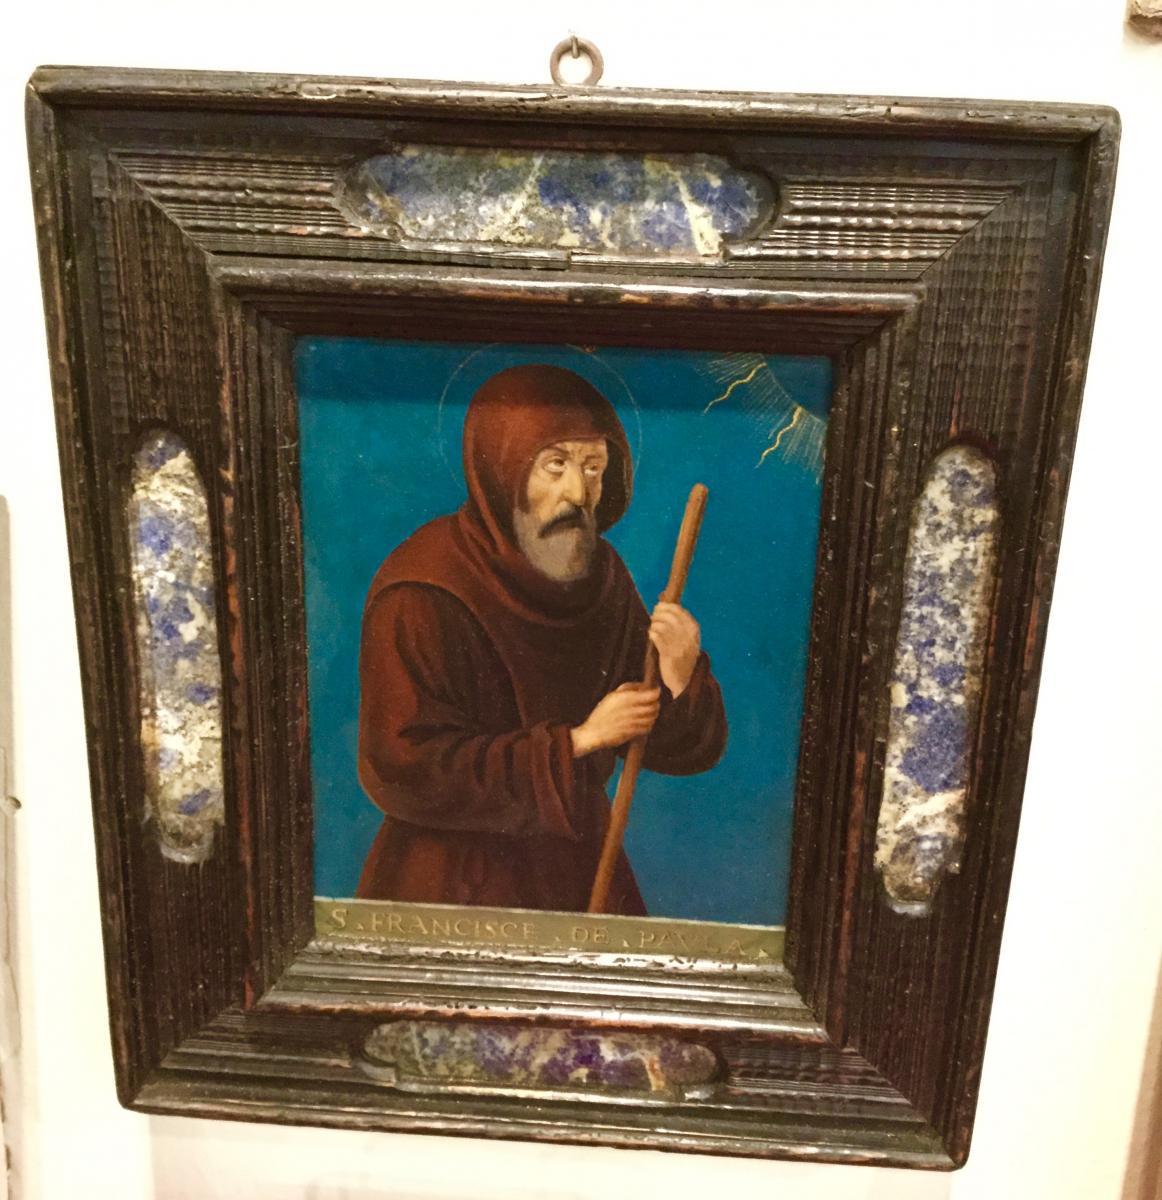 Saint Francois De Padoue, Oil On Copper (xvii) In An Italian Frame (xix)